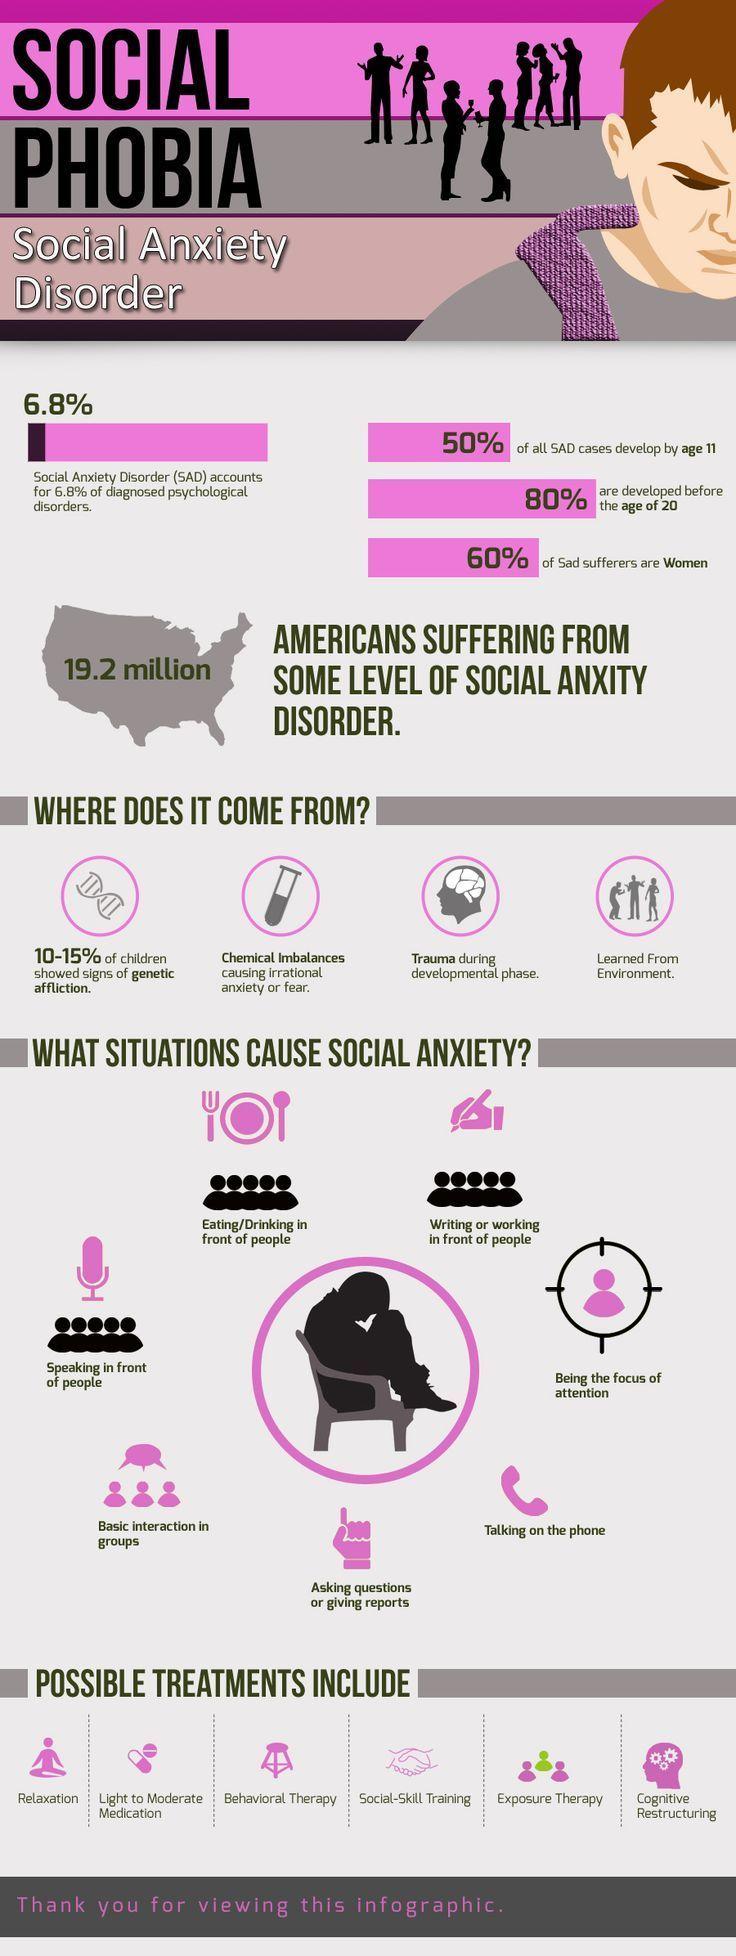 e77d326e0ec3419859b8ca48e9b56ce9--generalized-anxiety-disorder-social-anxiety-disorder.jpg (736×1956)